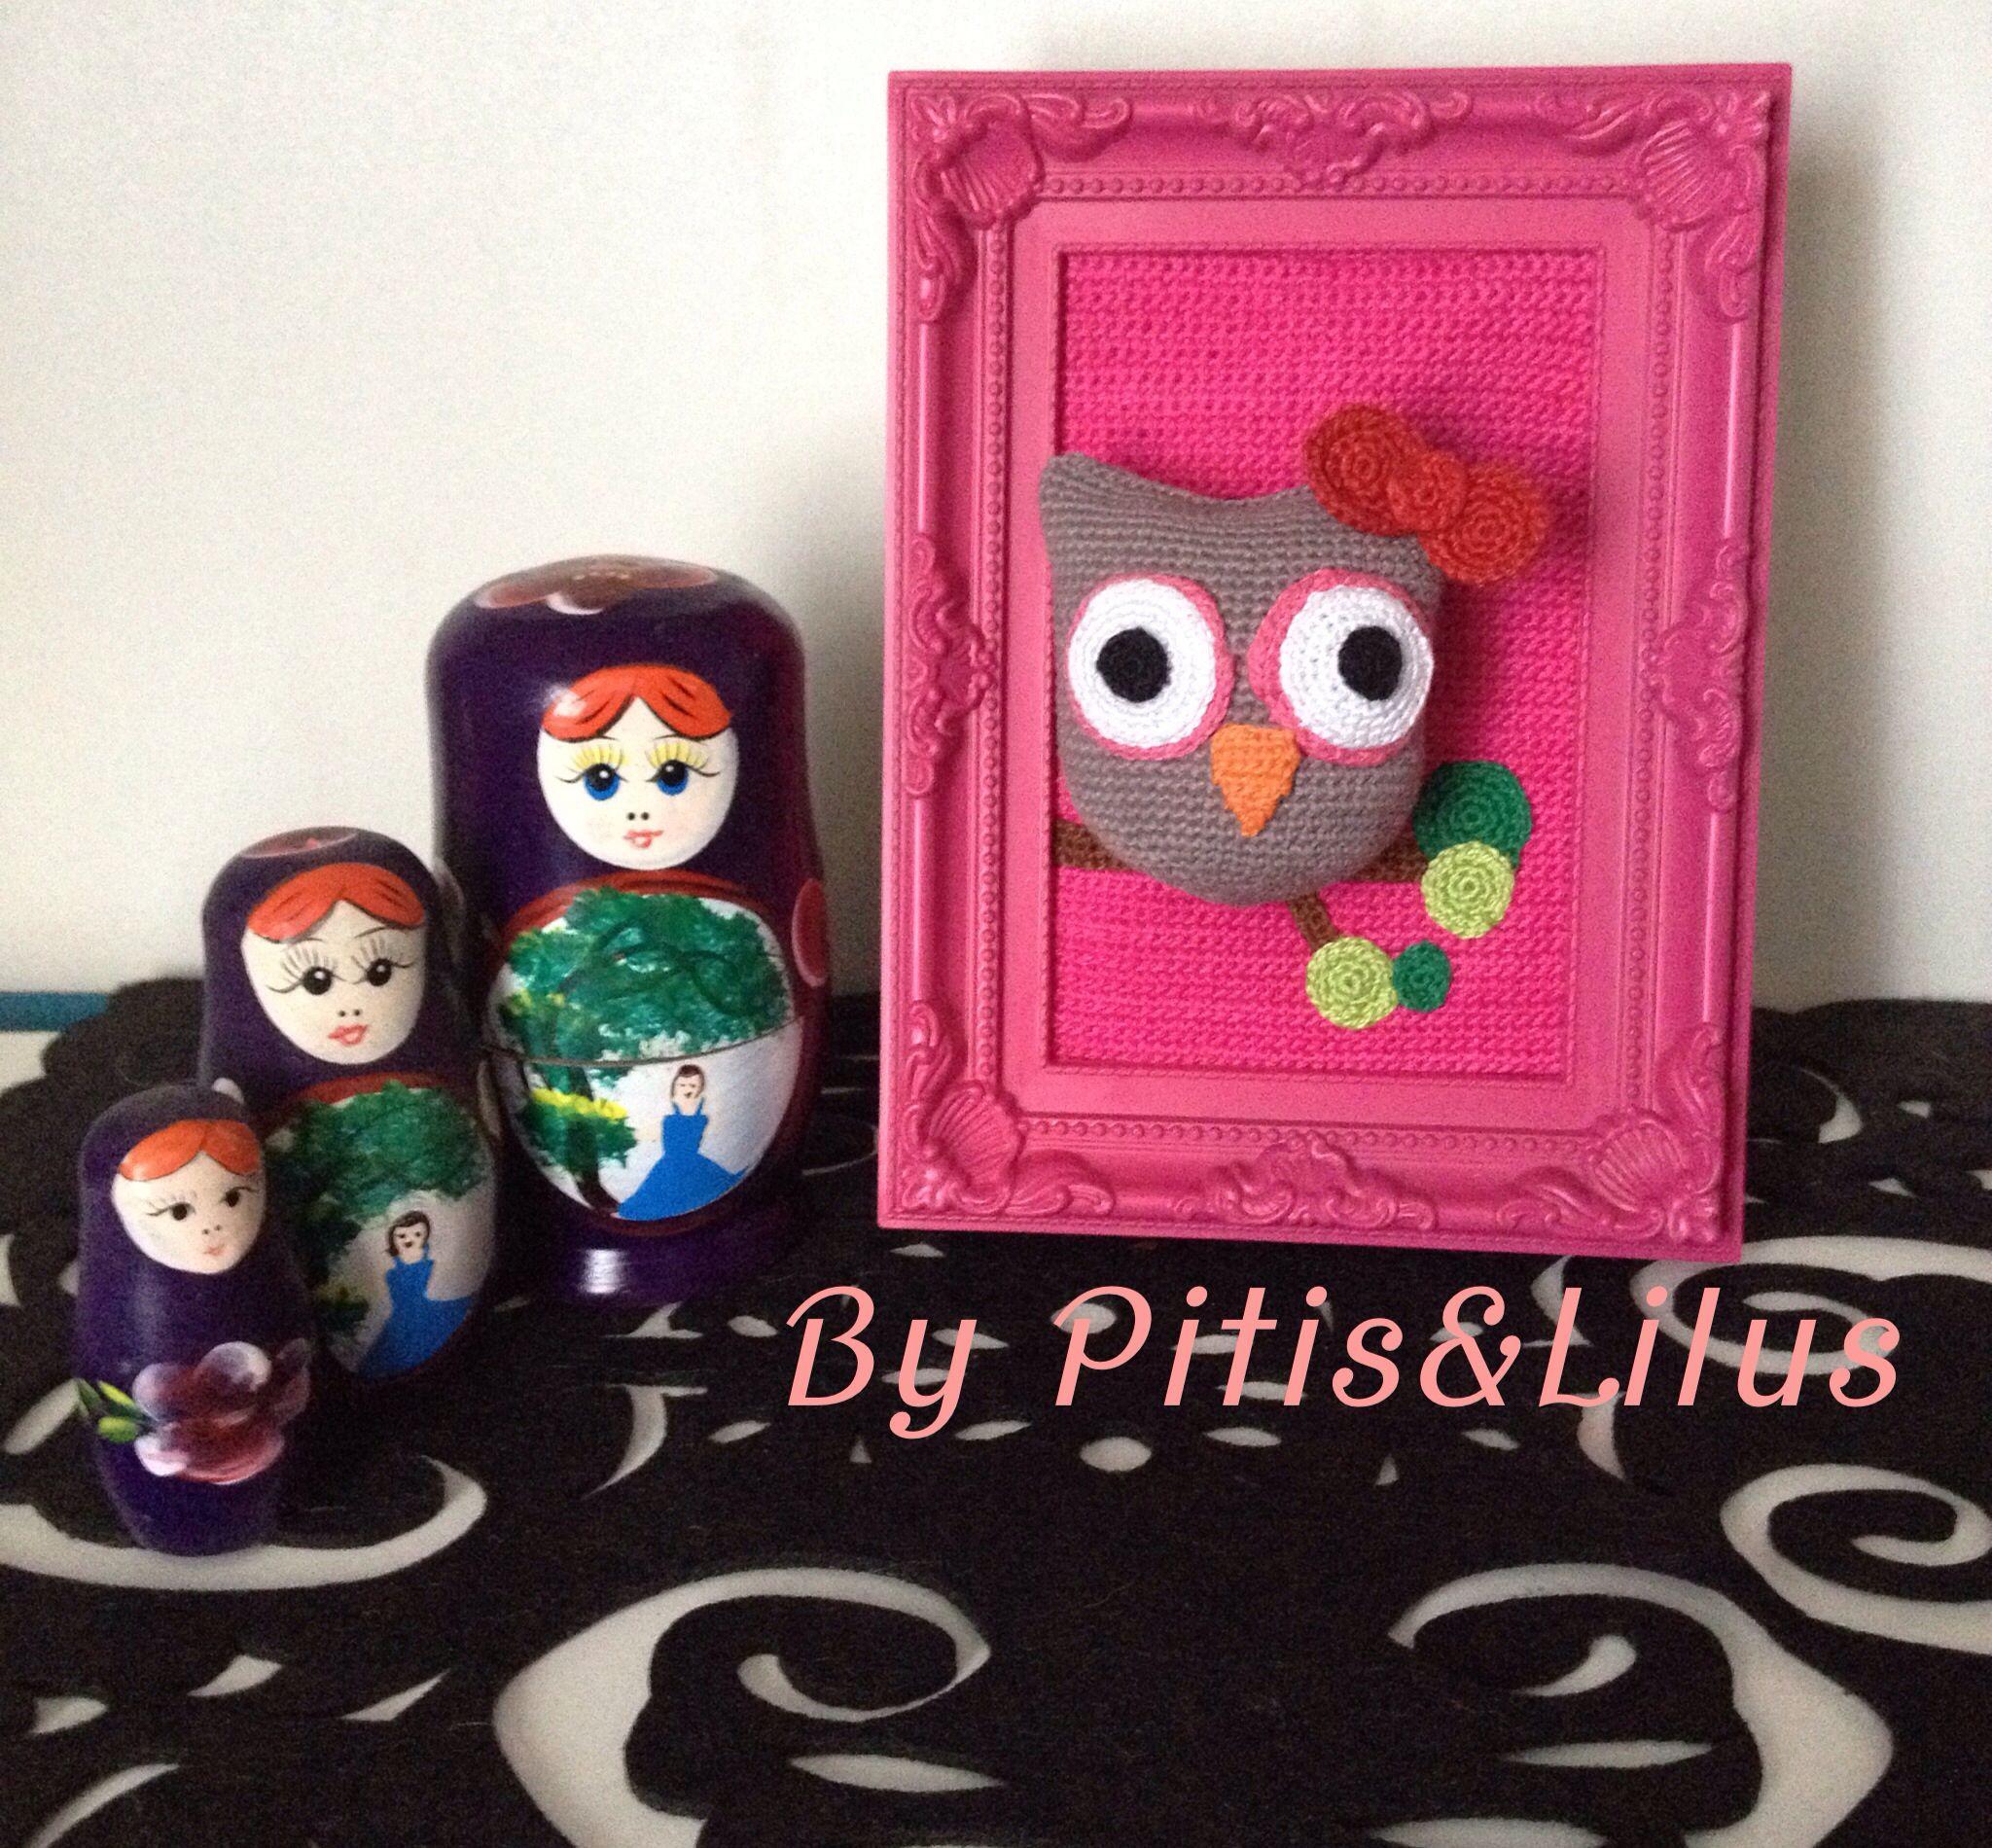 Cuadro decorativo con búho de amigurumi en fucsia /amigurumi owl decorative frame by Pitis&Lilus Info pitisandlilus@gmail.com